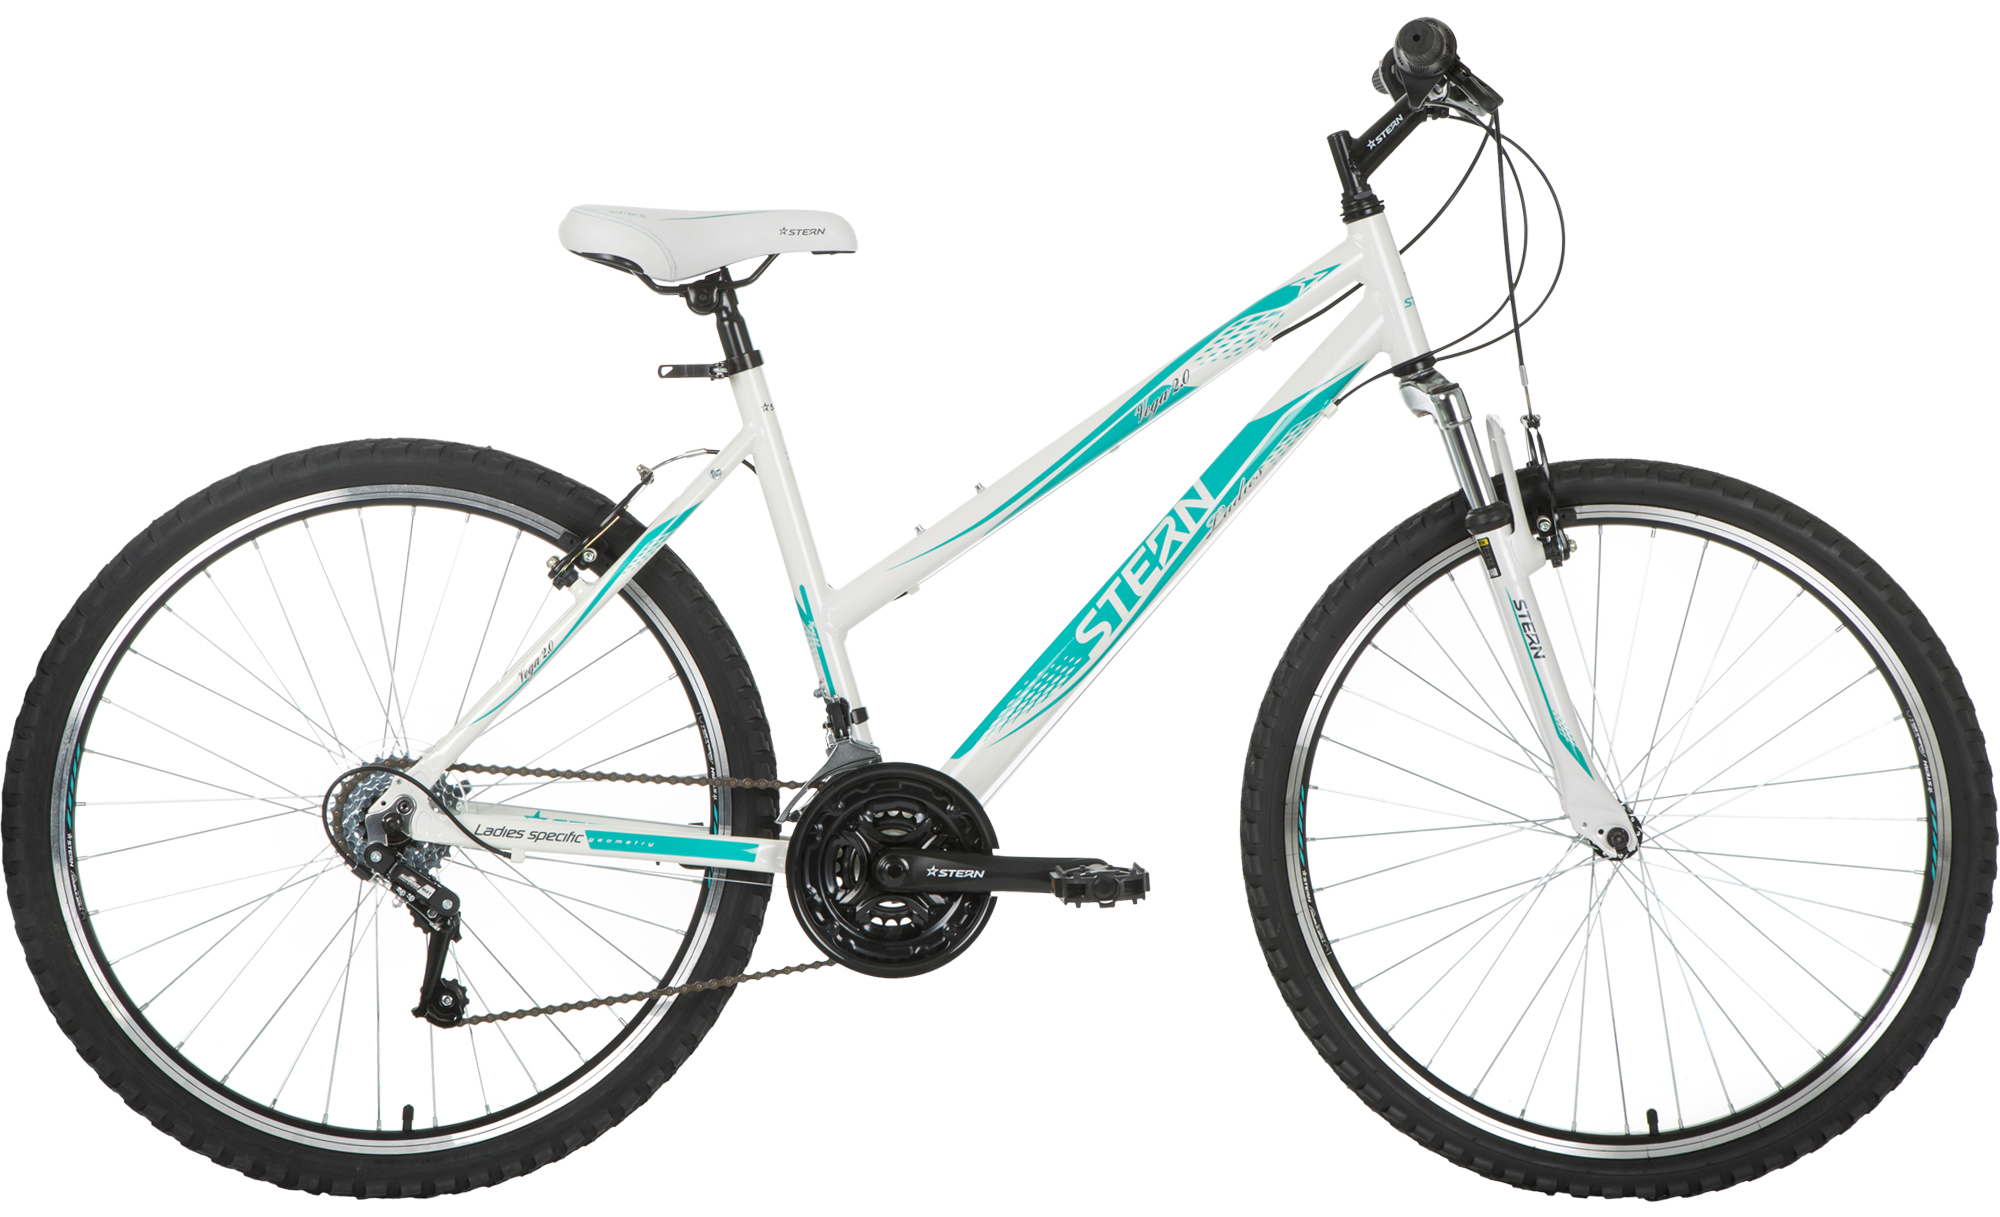 Stern Велосипед горный женский Stern Vega 2.0 26 stern велосипед горный женский stern vega 1 0 26